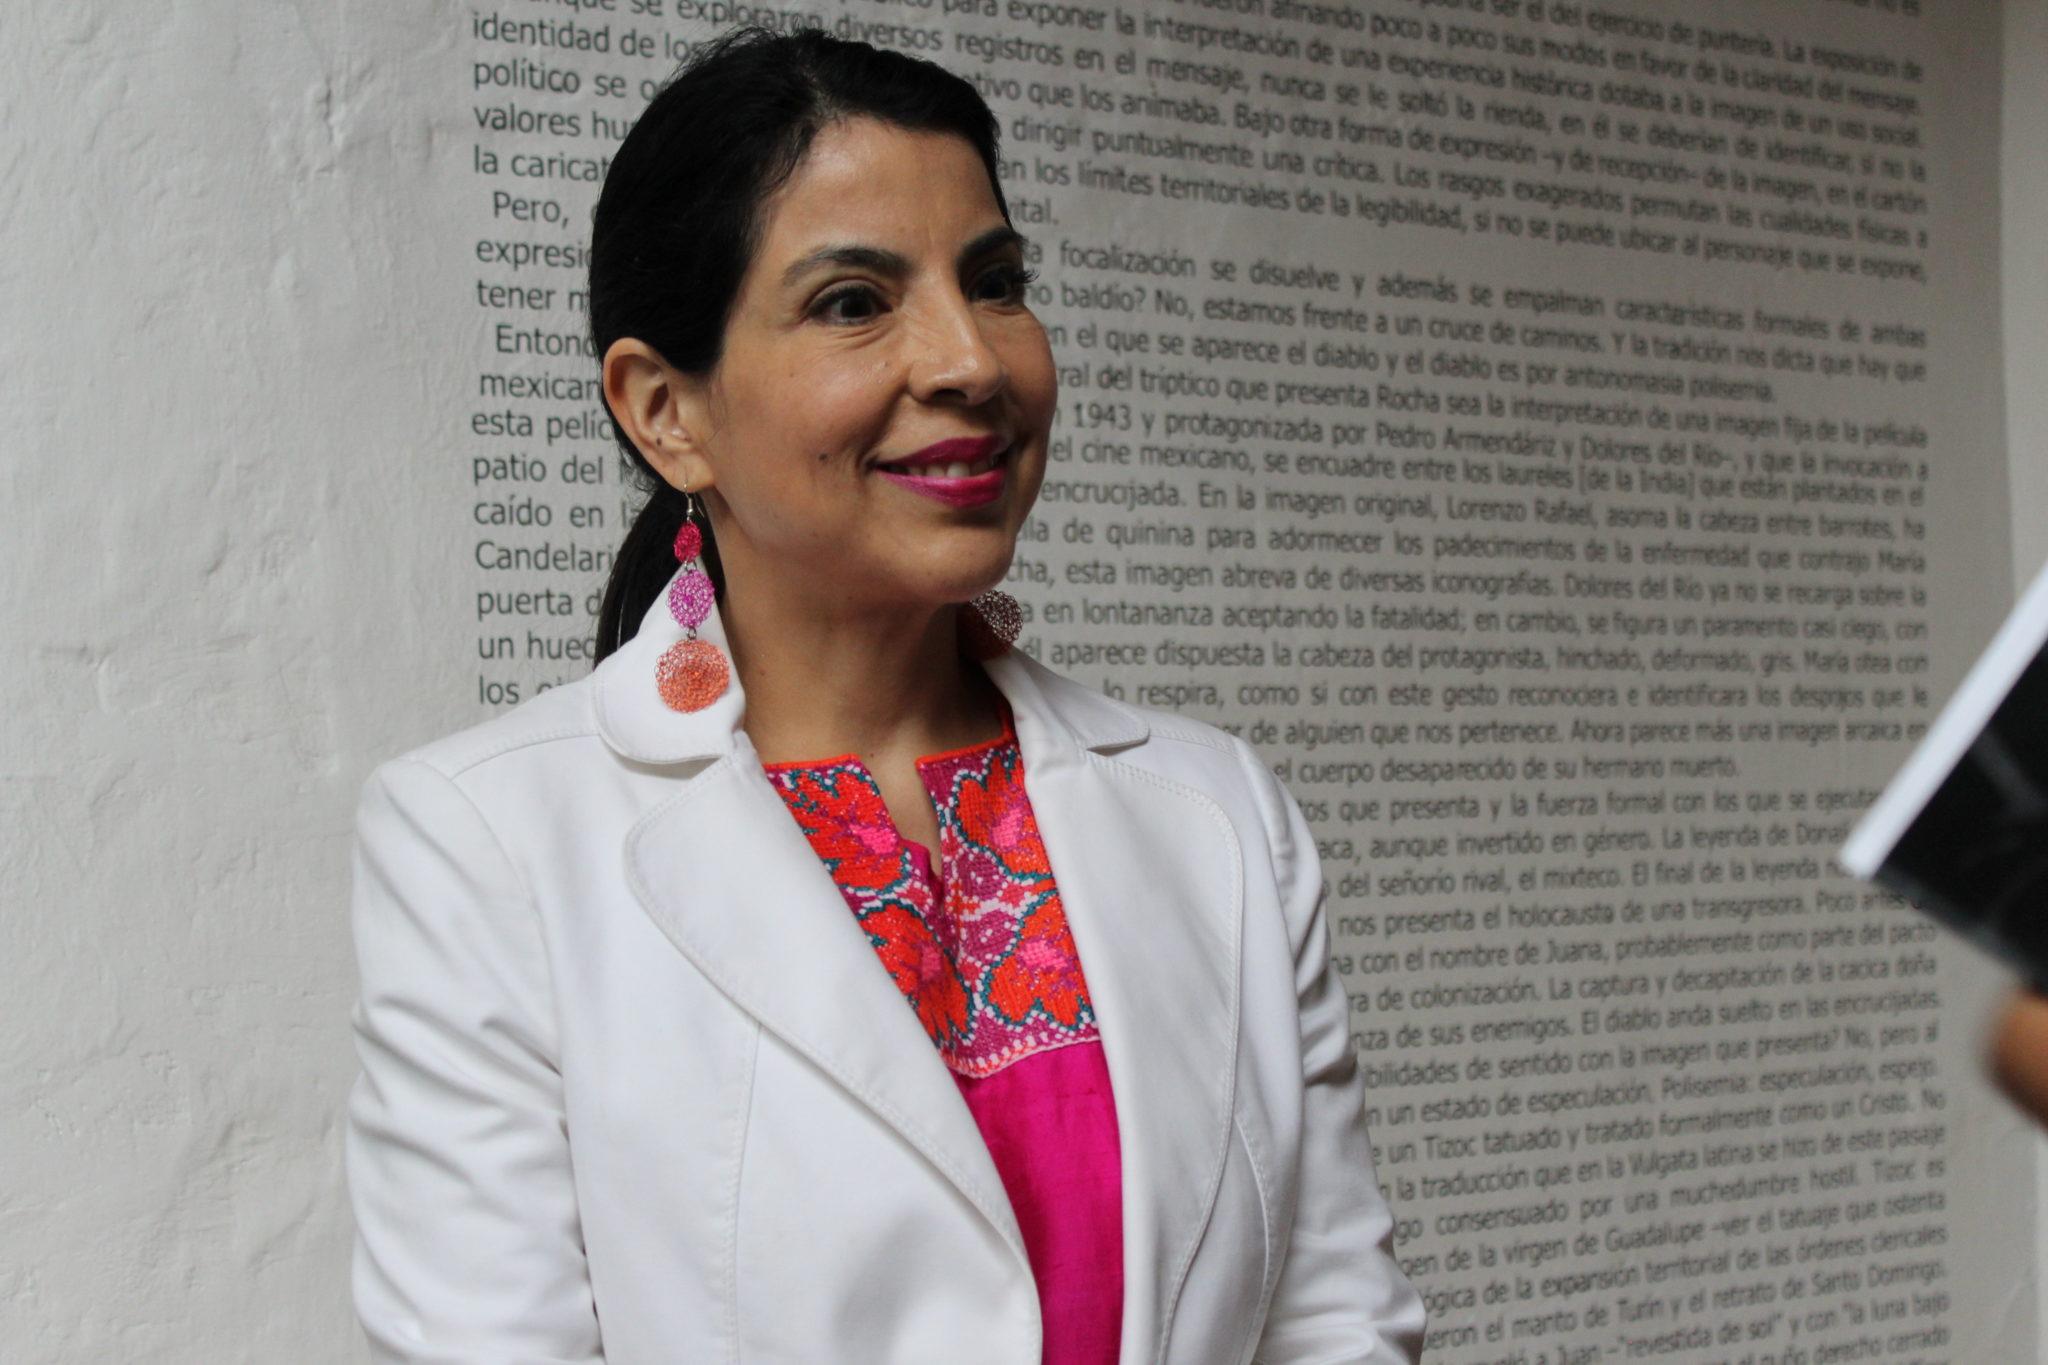 Incierto, futuro de OaxacaCine